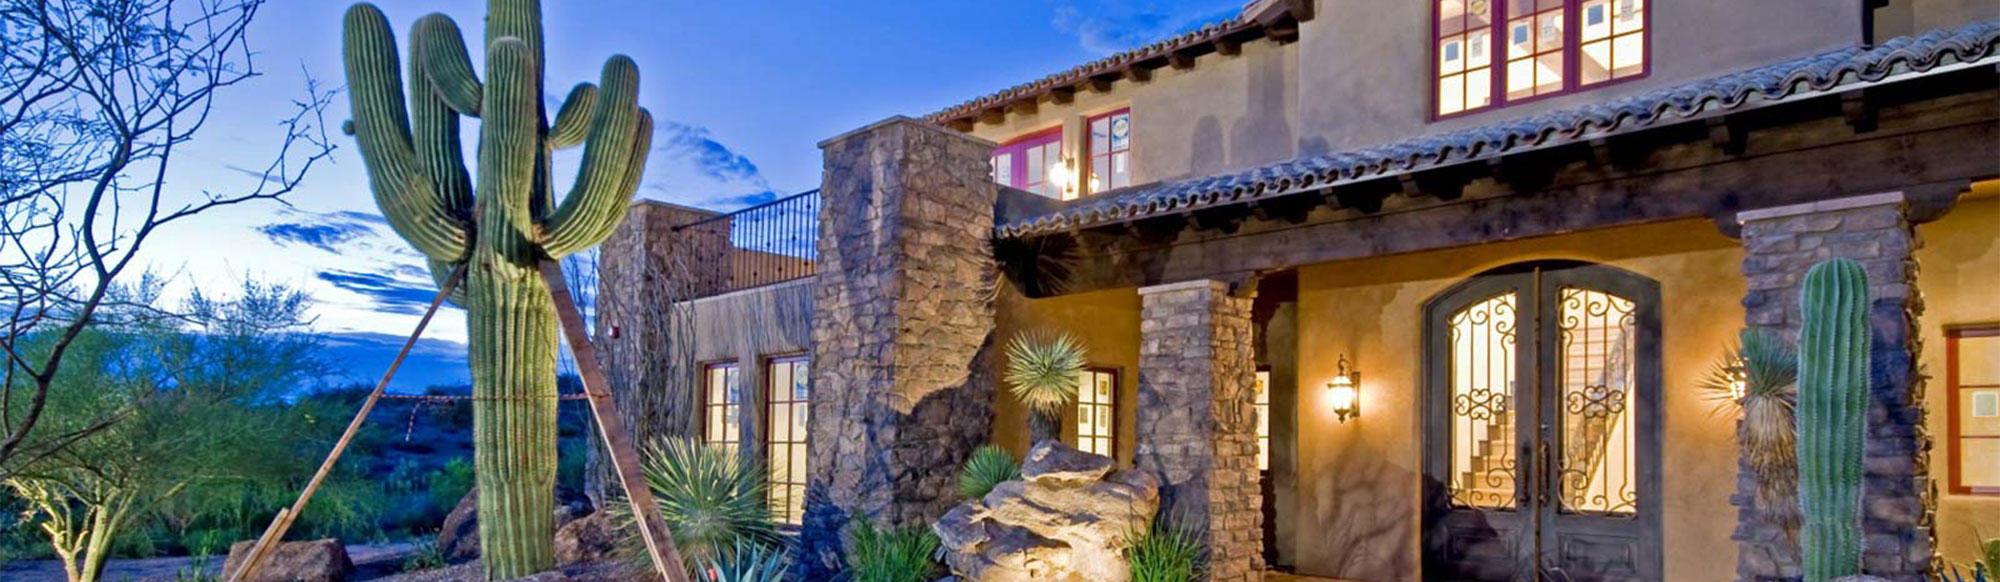 Real Estate Photo 1